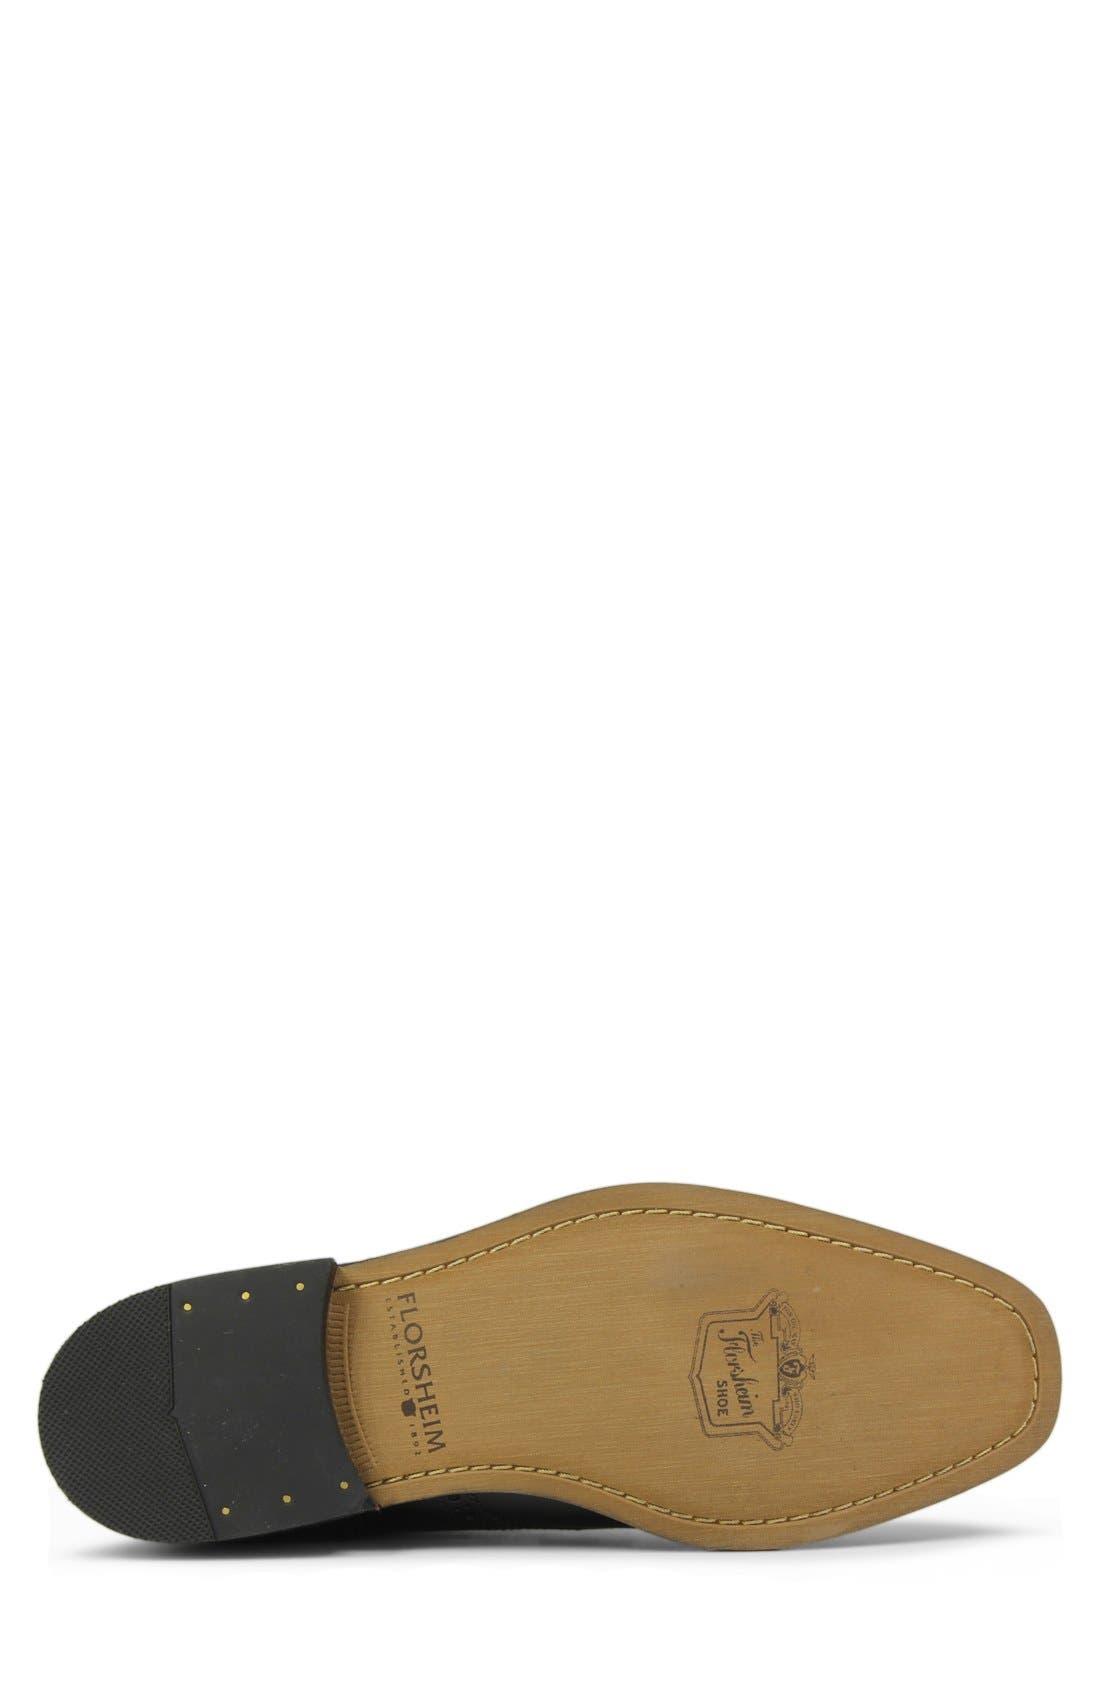 'Castellano' Chukka Boot,                             Alternate thumbnail 4, color,                             001